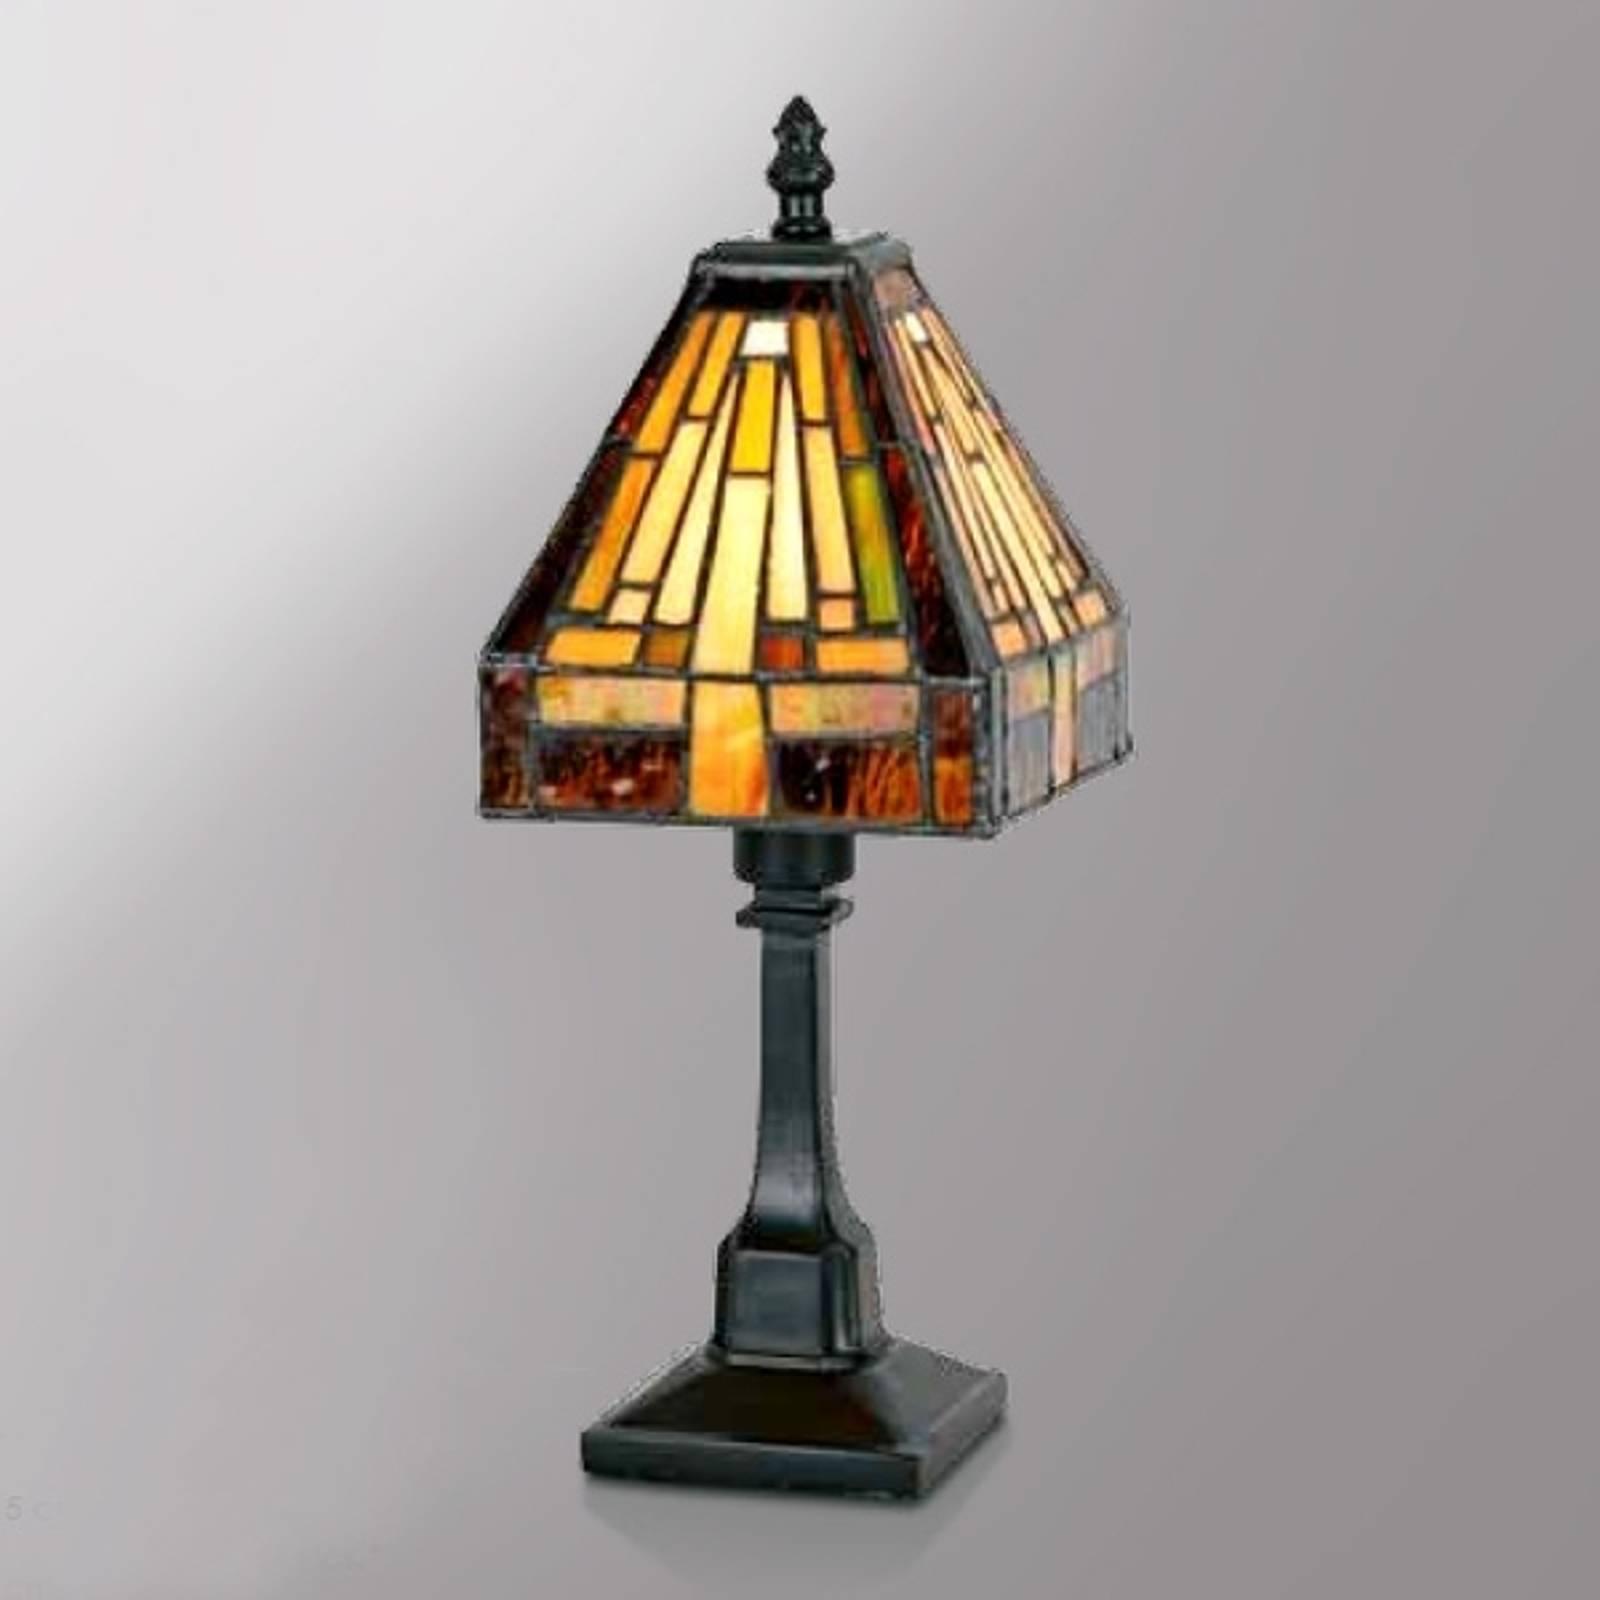 Veelzijdige tafellamp Bea in Tiffany-stijl